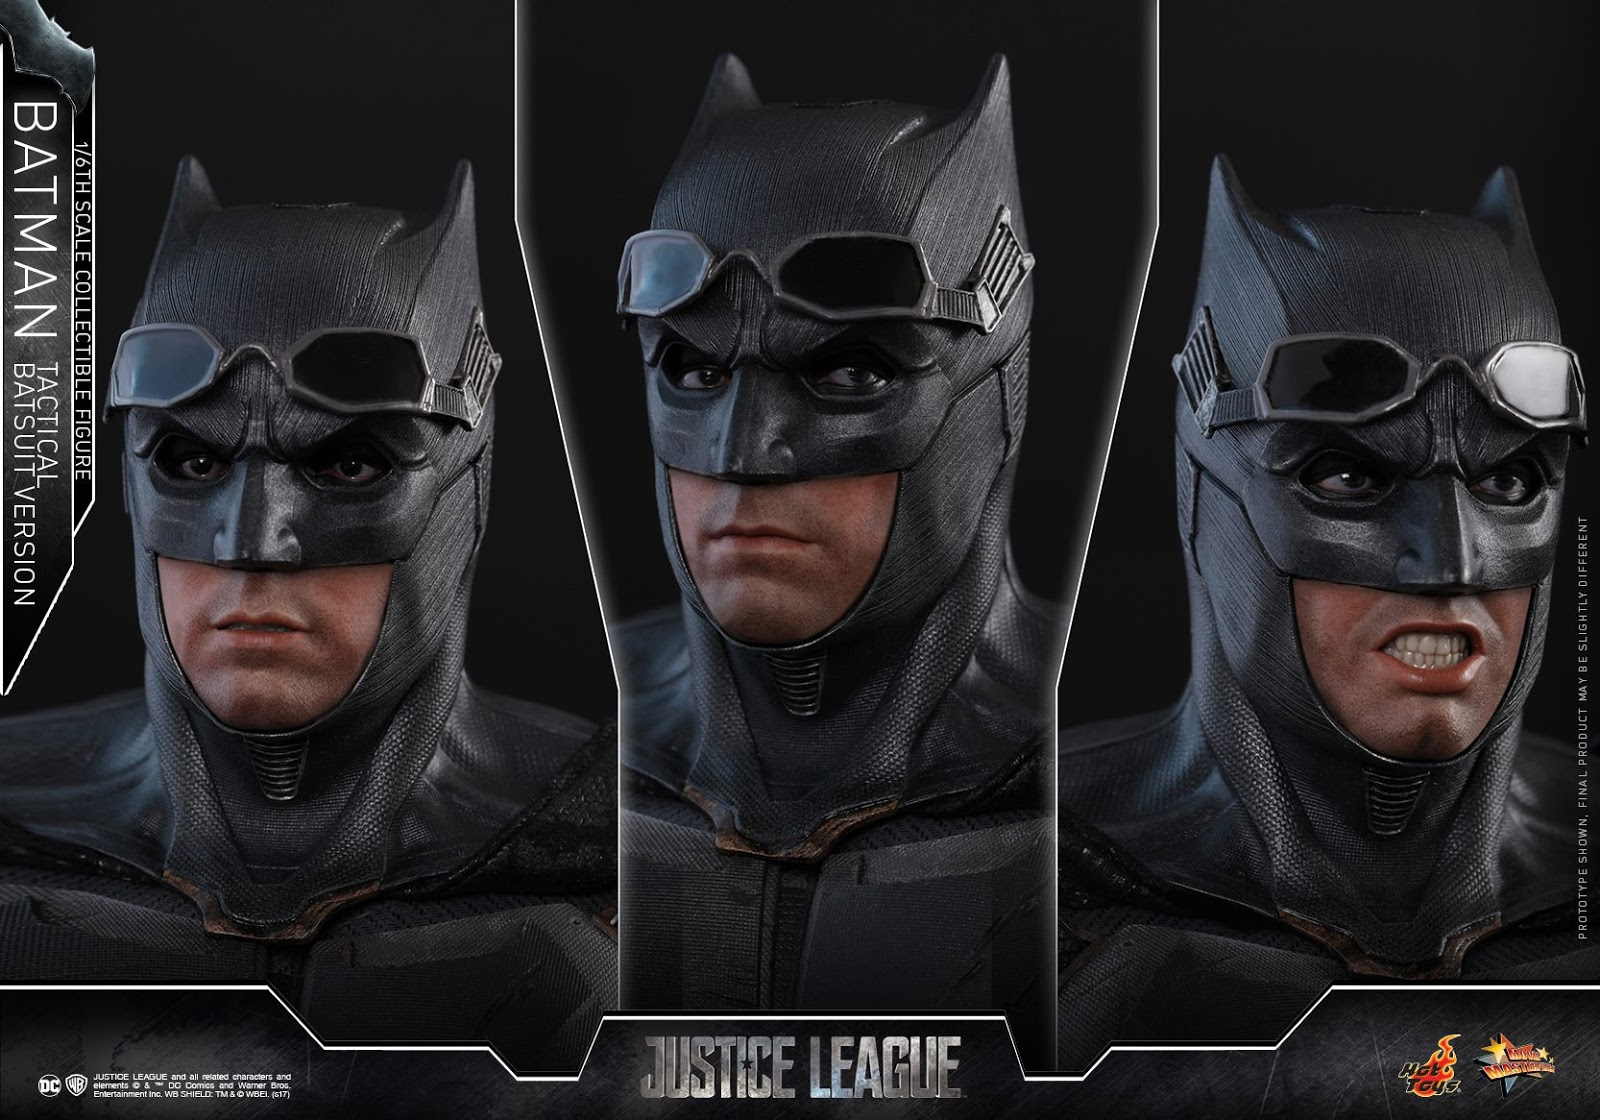 Kostum Baru Batman Justice League Zoid Film Komik